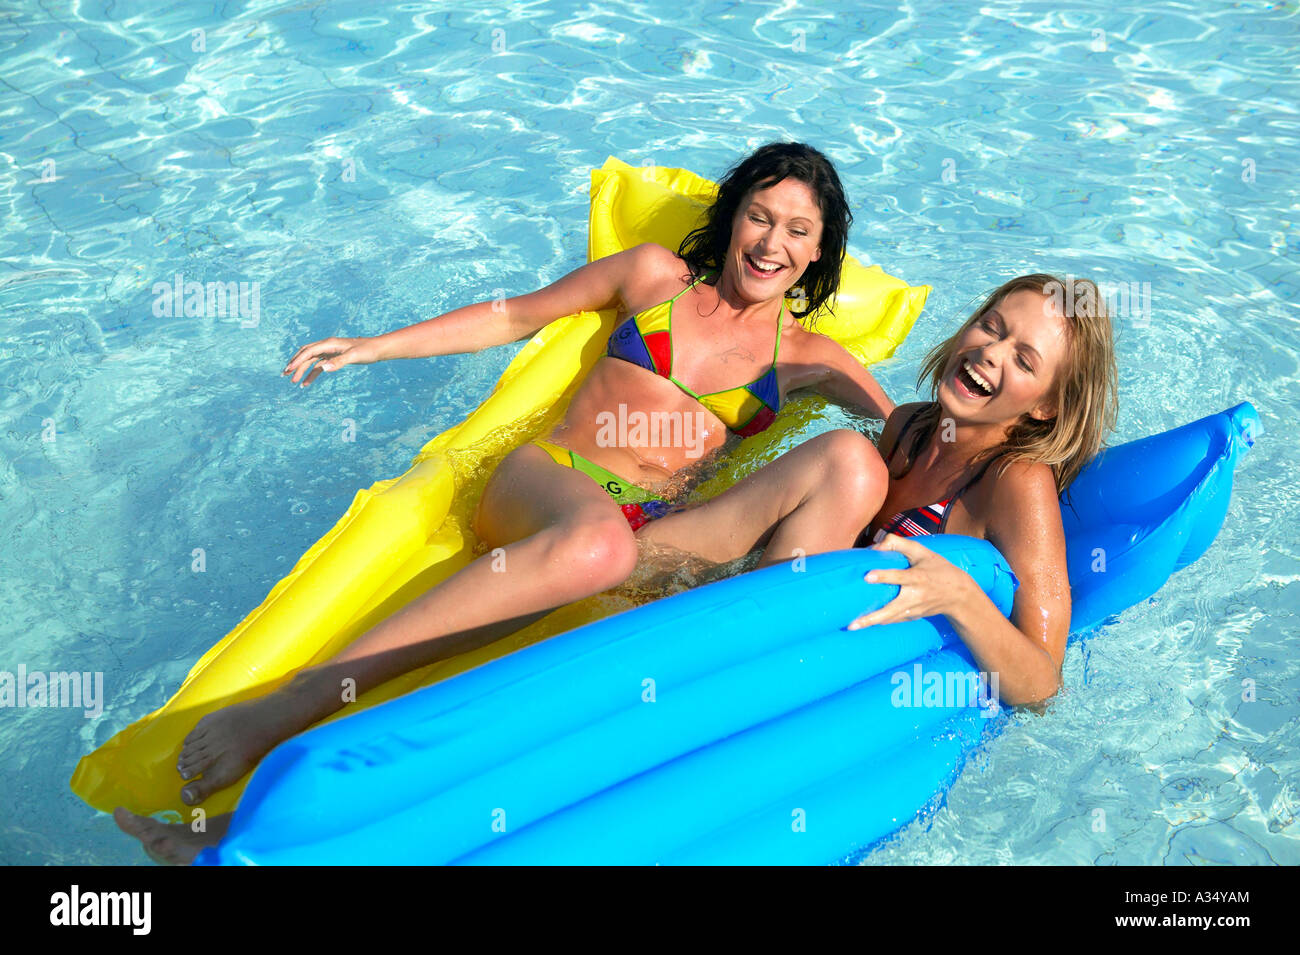 2 huehner im pool auf mallorca 10